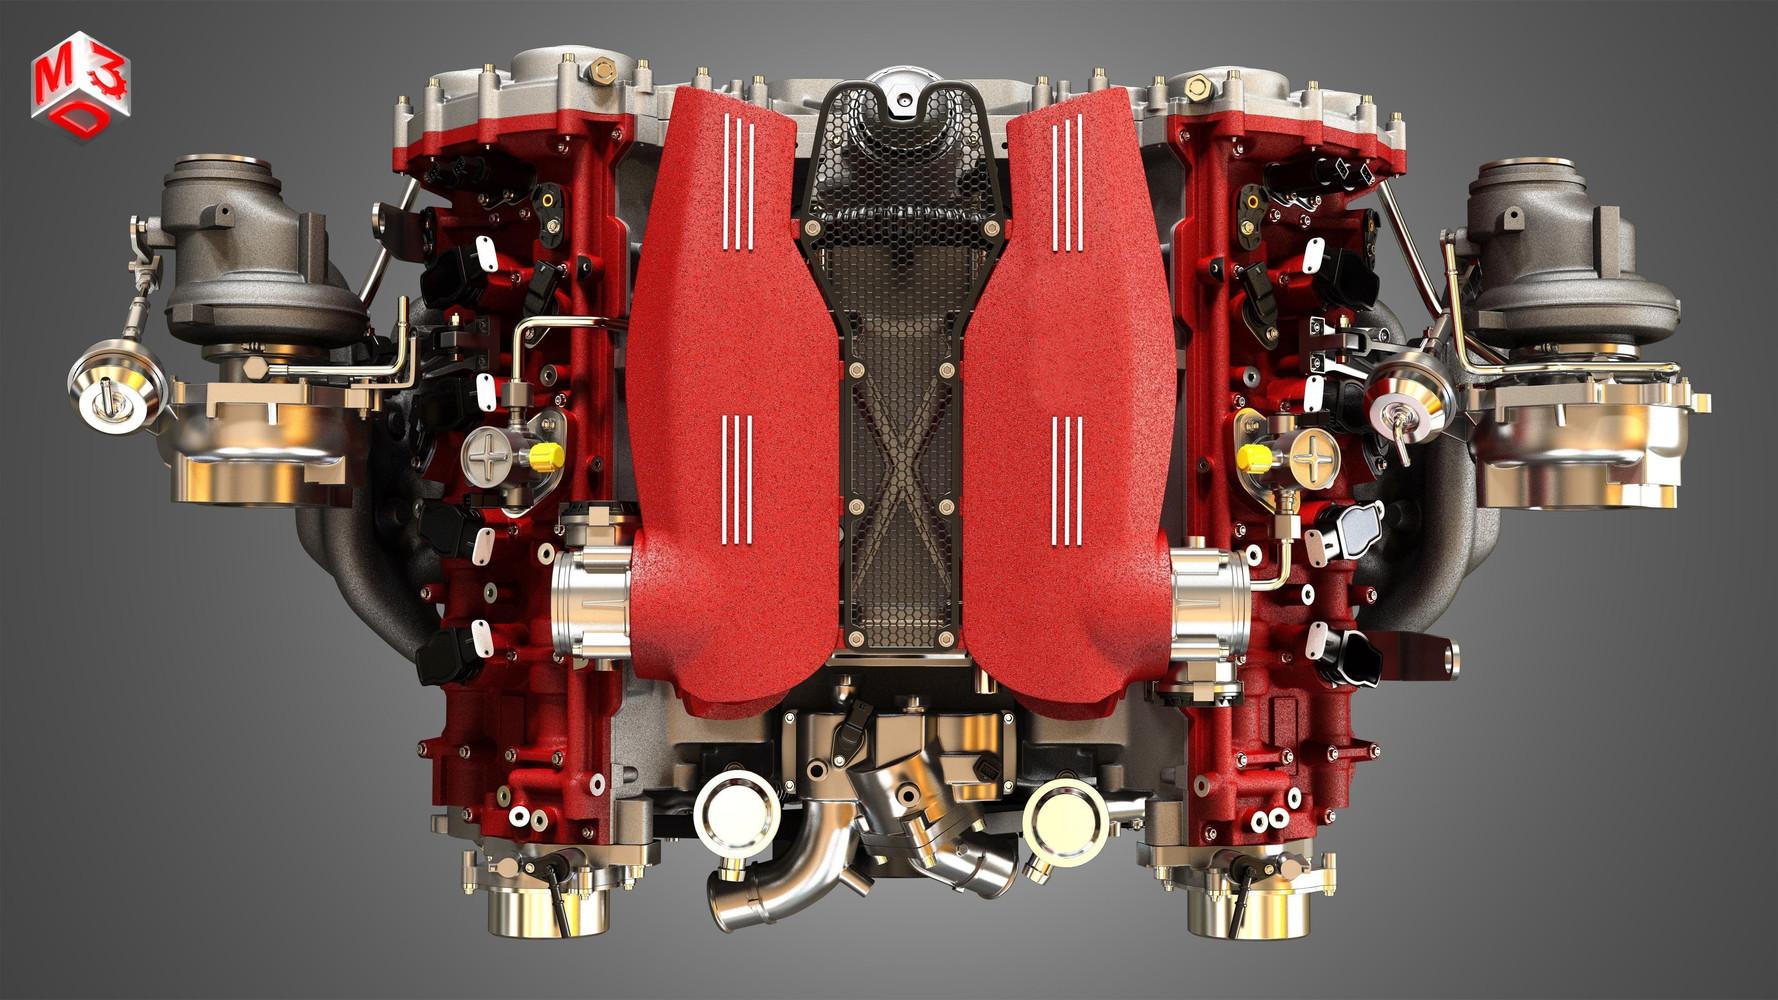 488-gtb-engine-v8-twin-turbo-engine-3d-m